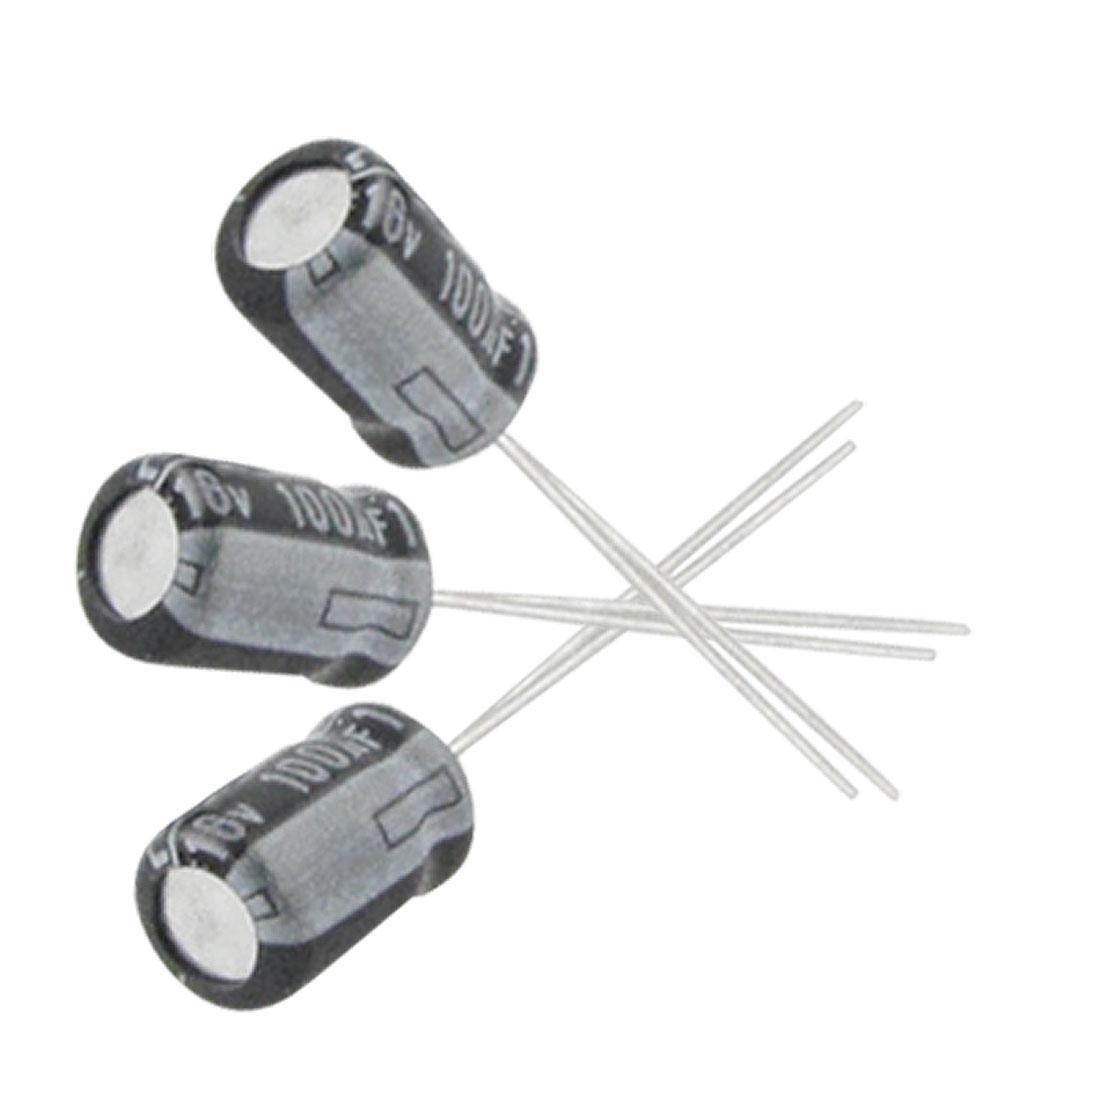 10 x 100uF 16V 105C Radial Electrolytic Capacitor 5x7mm